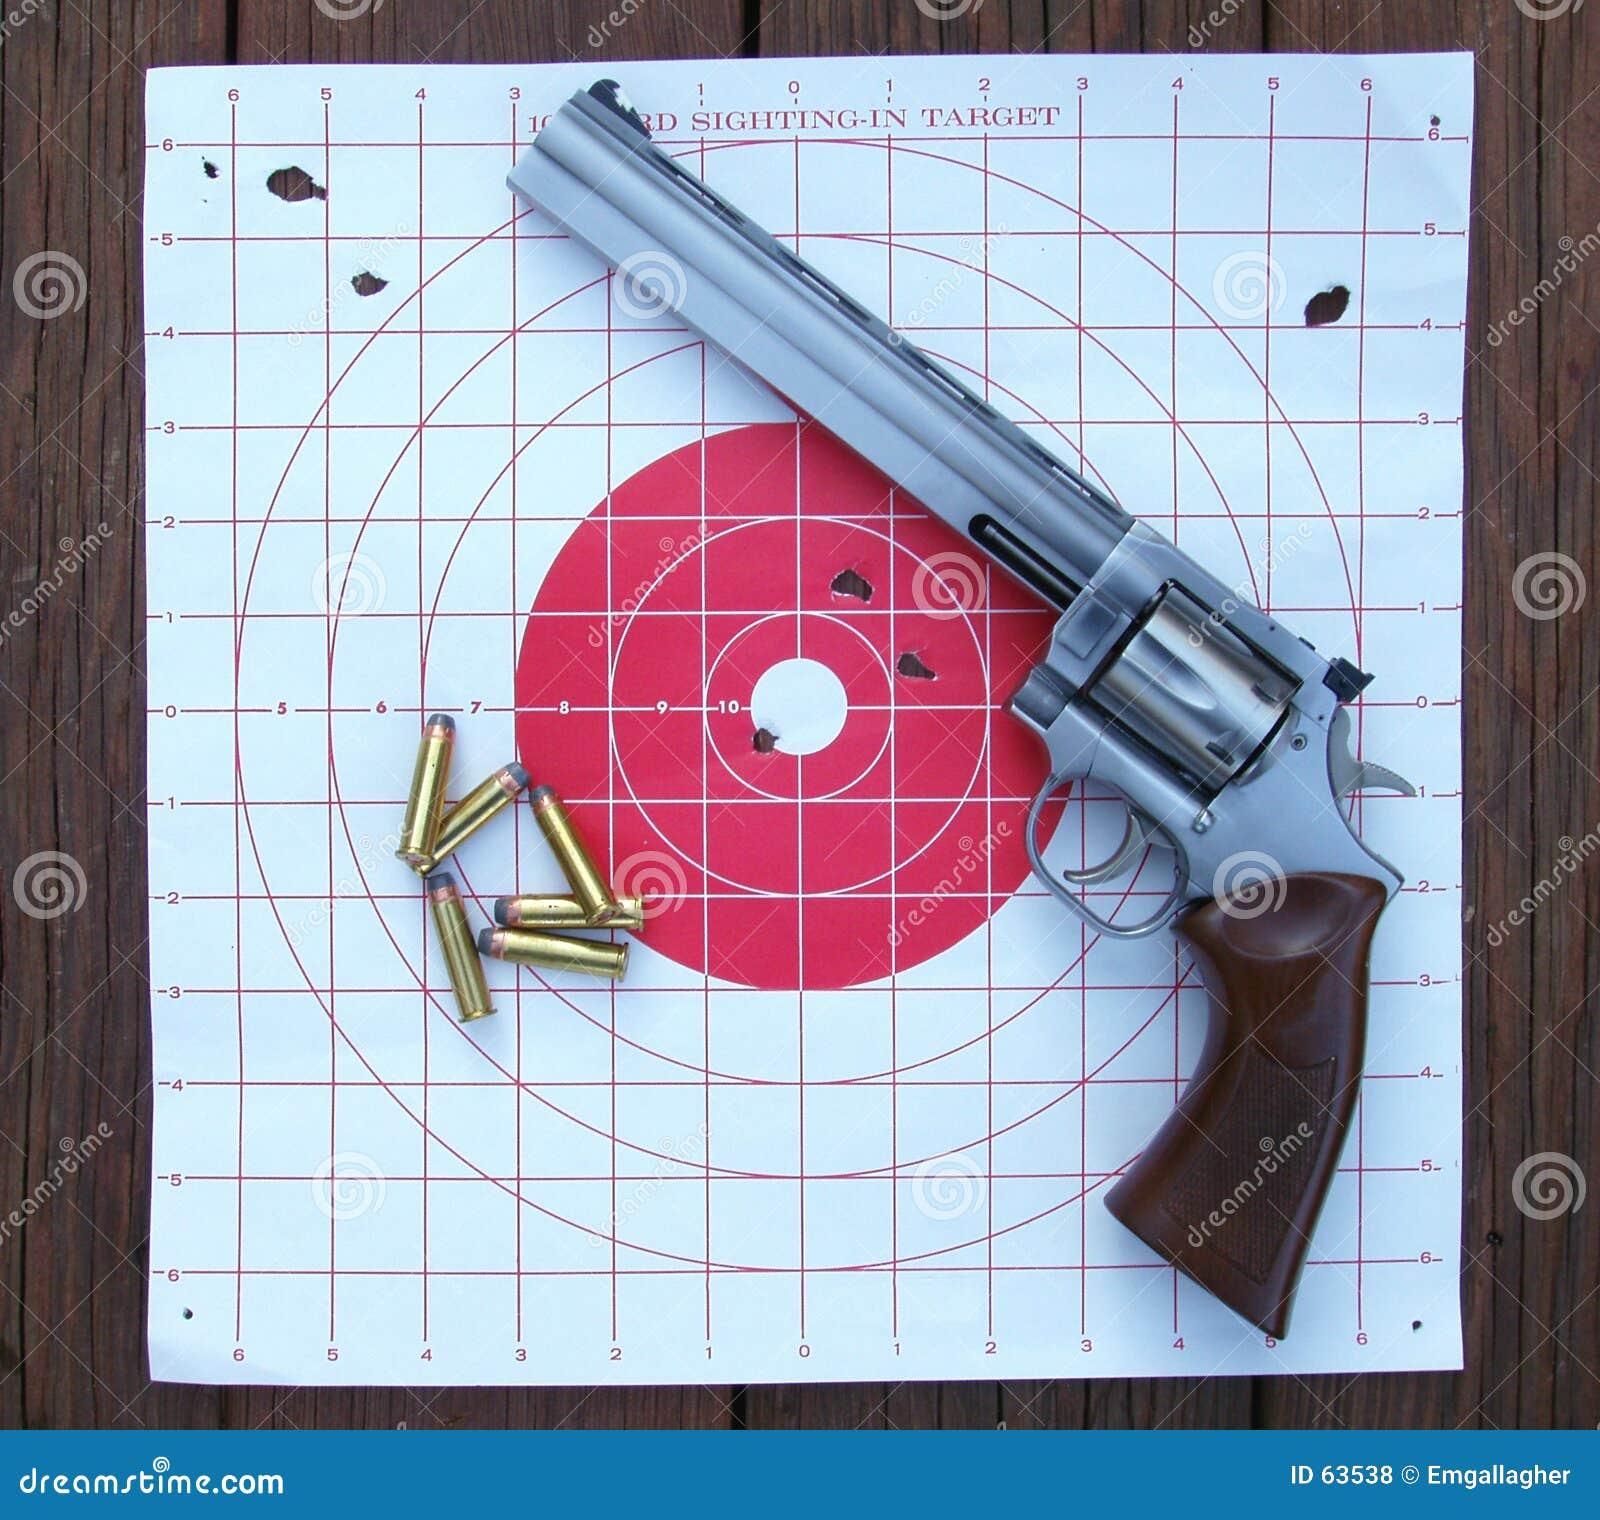 Revolver, remboursements in fine et cible